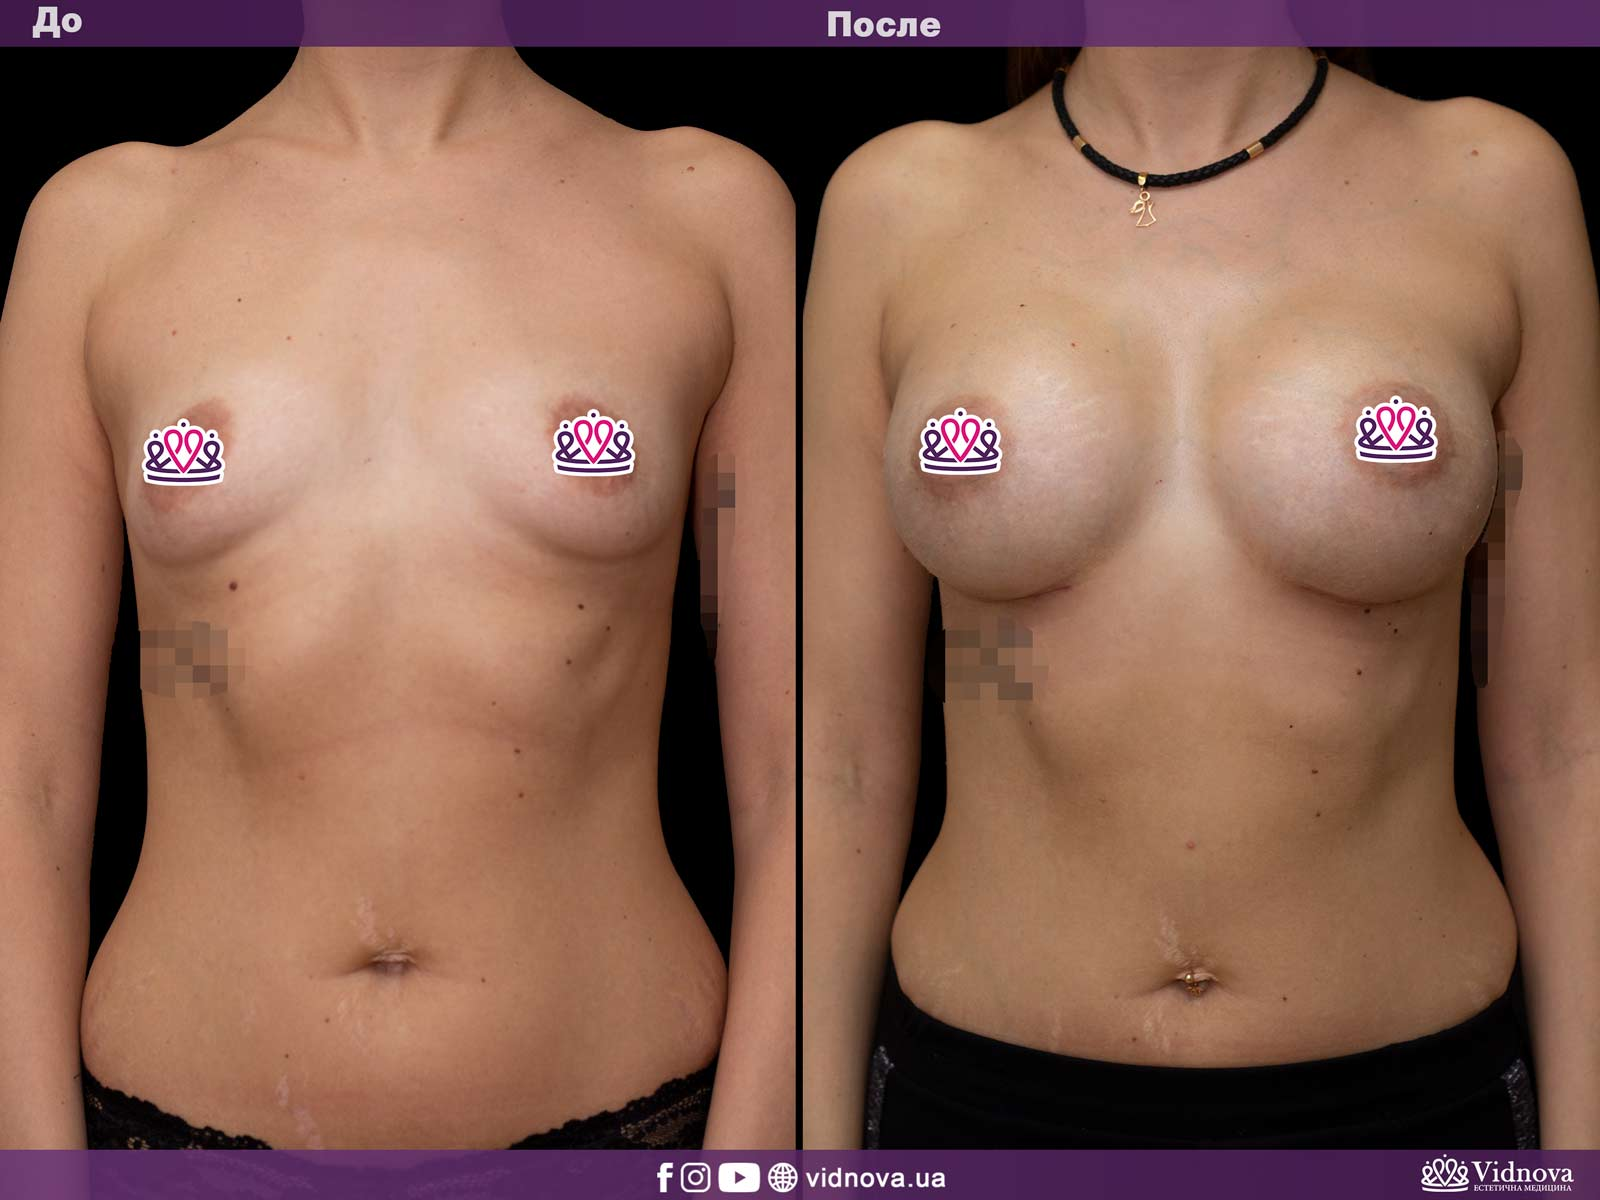 Увеличение груди: Фото ДО и ПОСЛЕ - Пример №19-1 - Клиника Vidnova